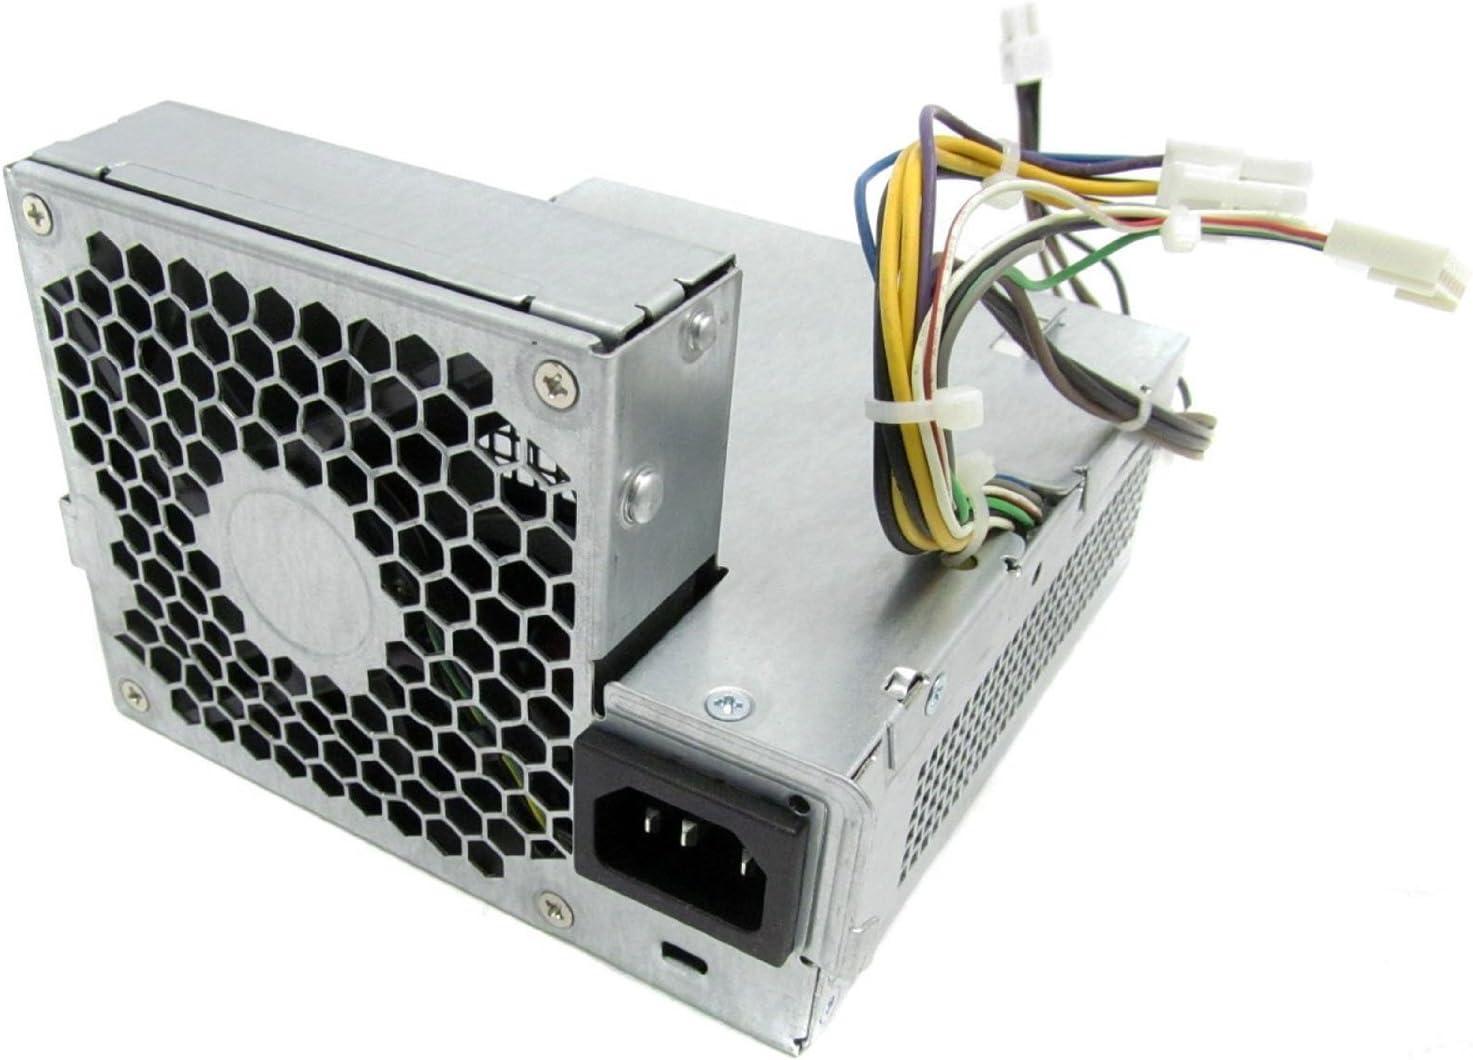 HP 611482-001 240W 8200 SFF series PSU